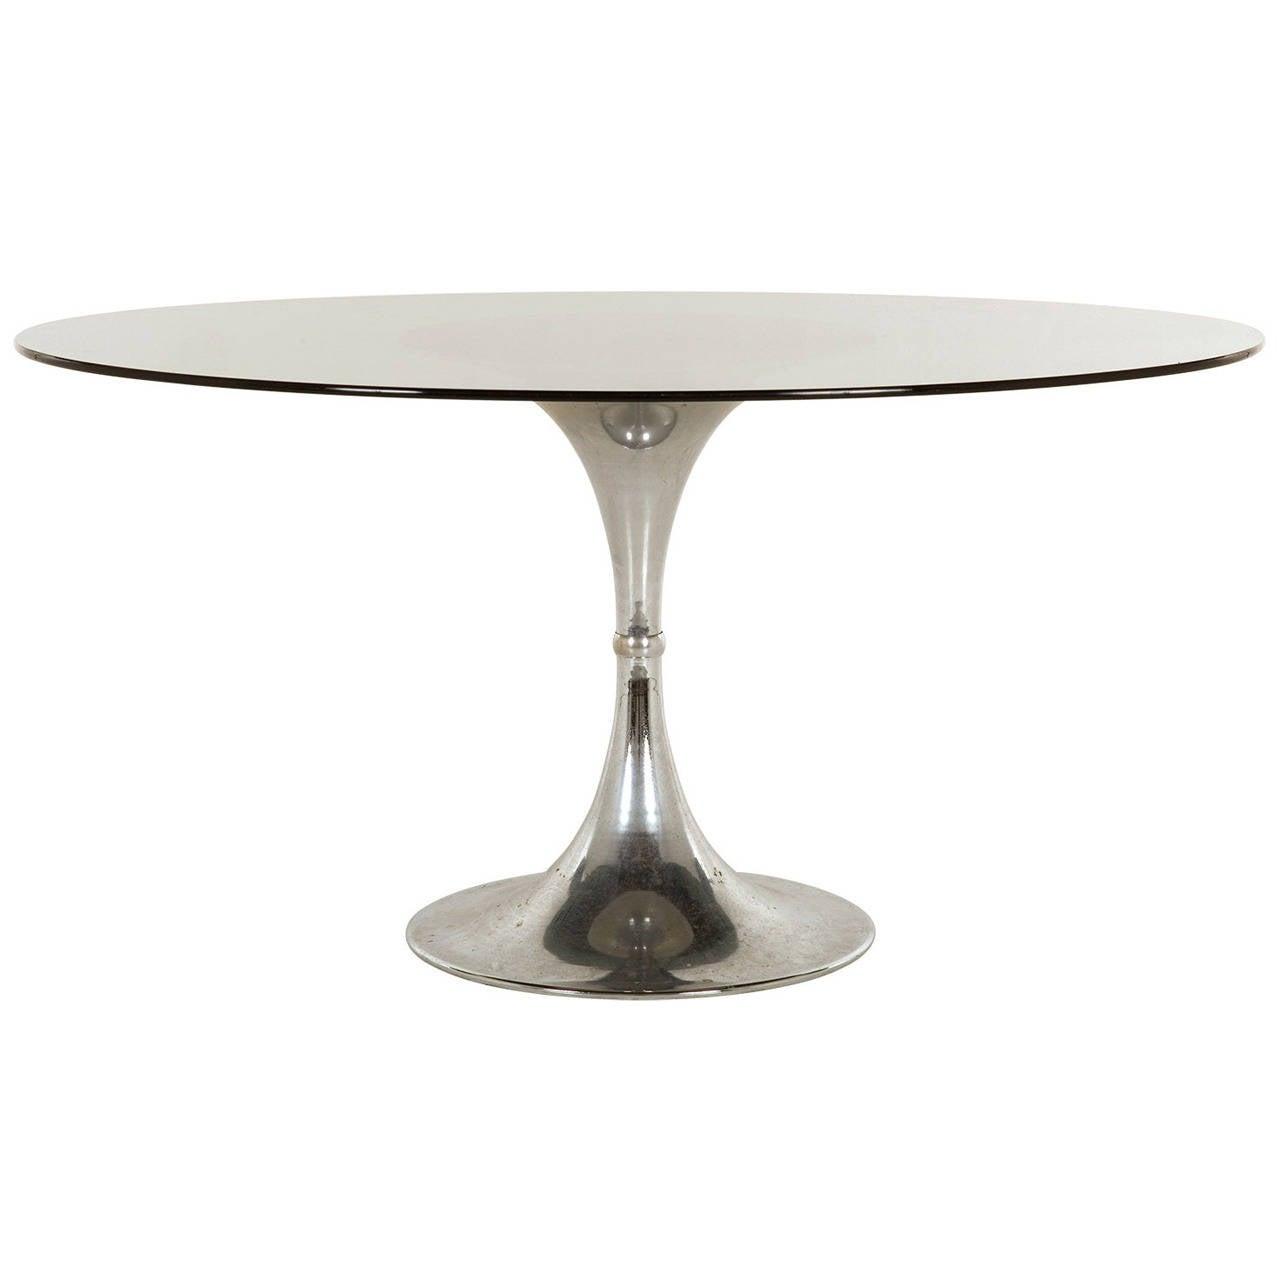 vintage tulip table at 1stdibs. Black Bedroom Furniture Sets. Home Design Ideas